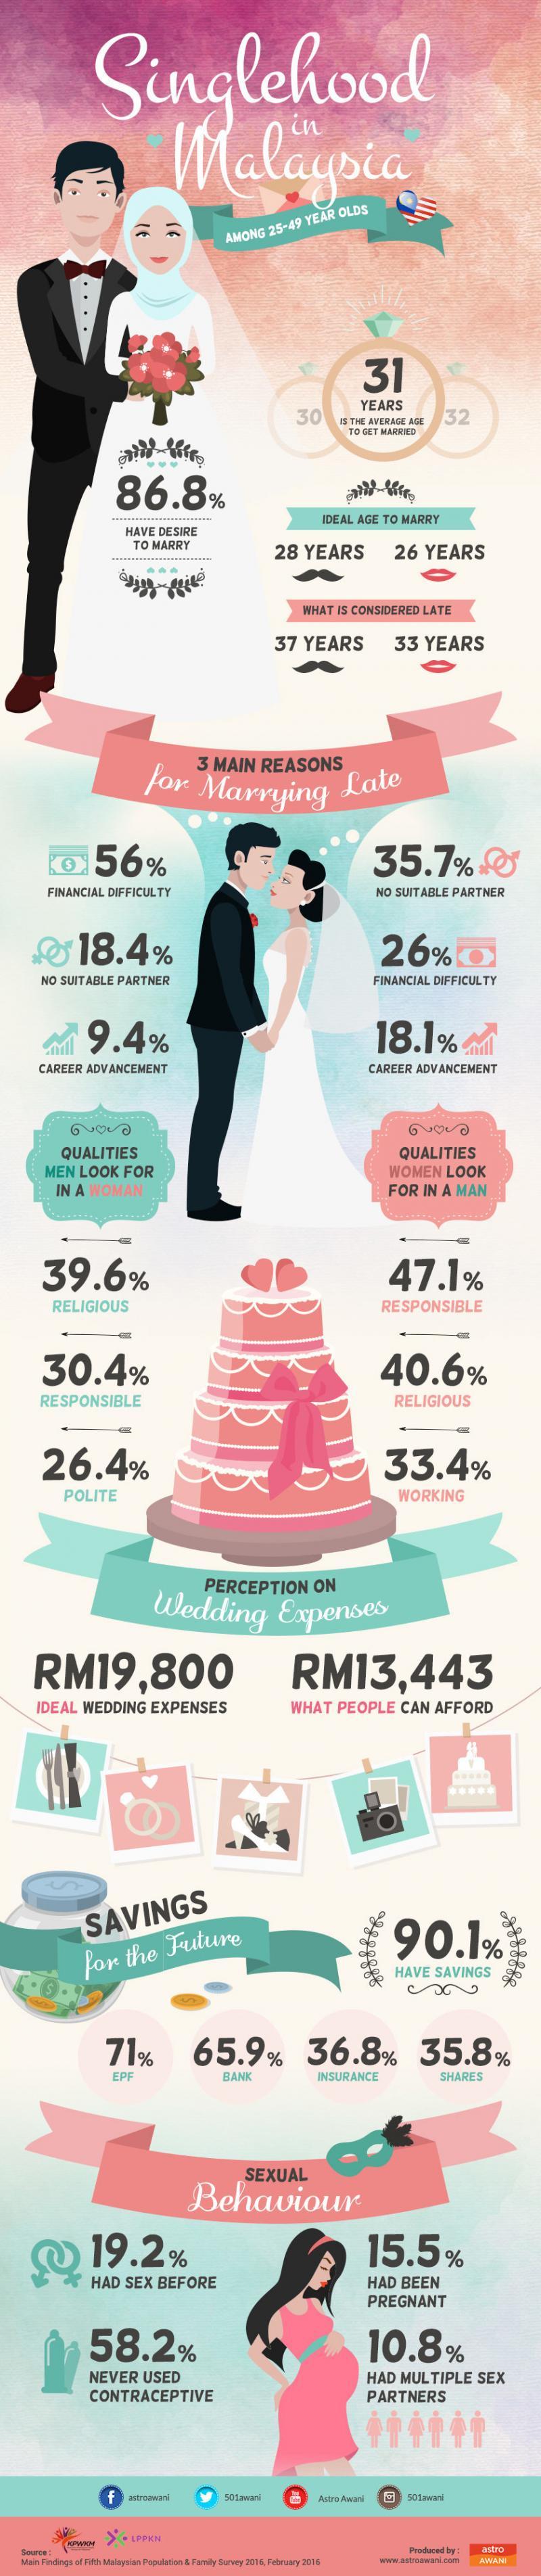 Singlehood in #Malaysia #infographic